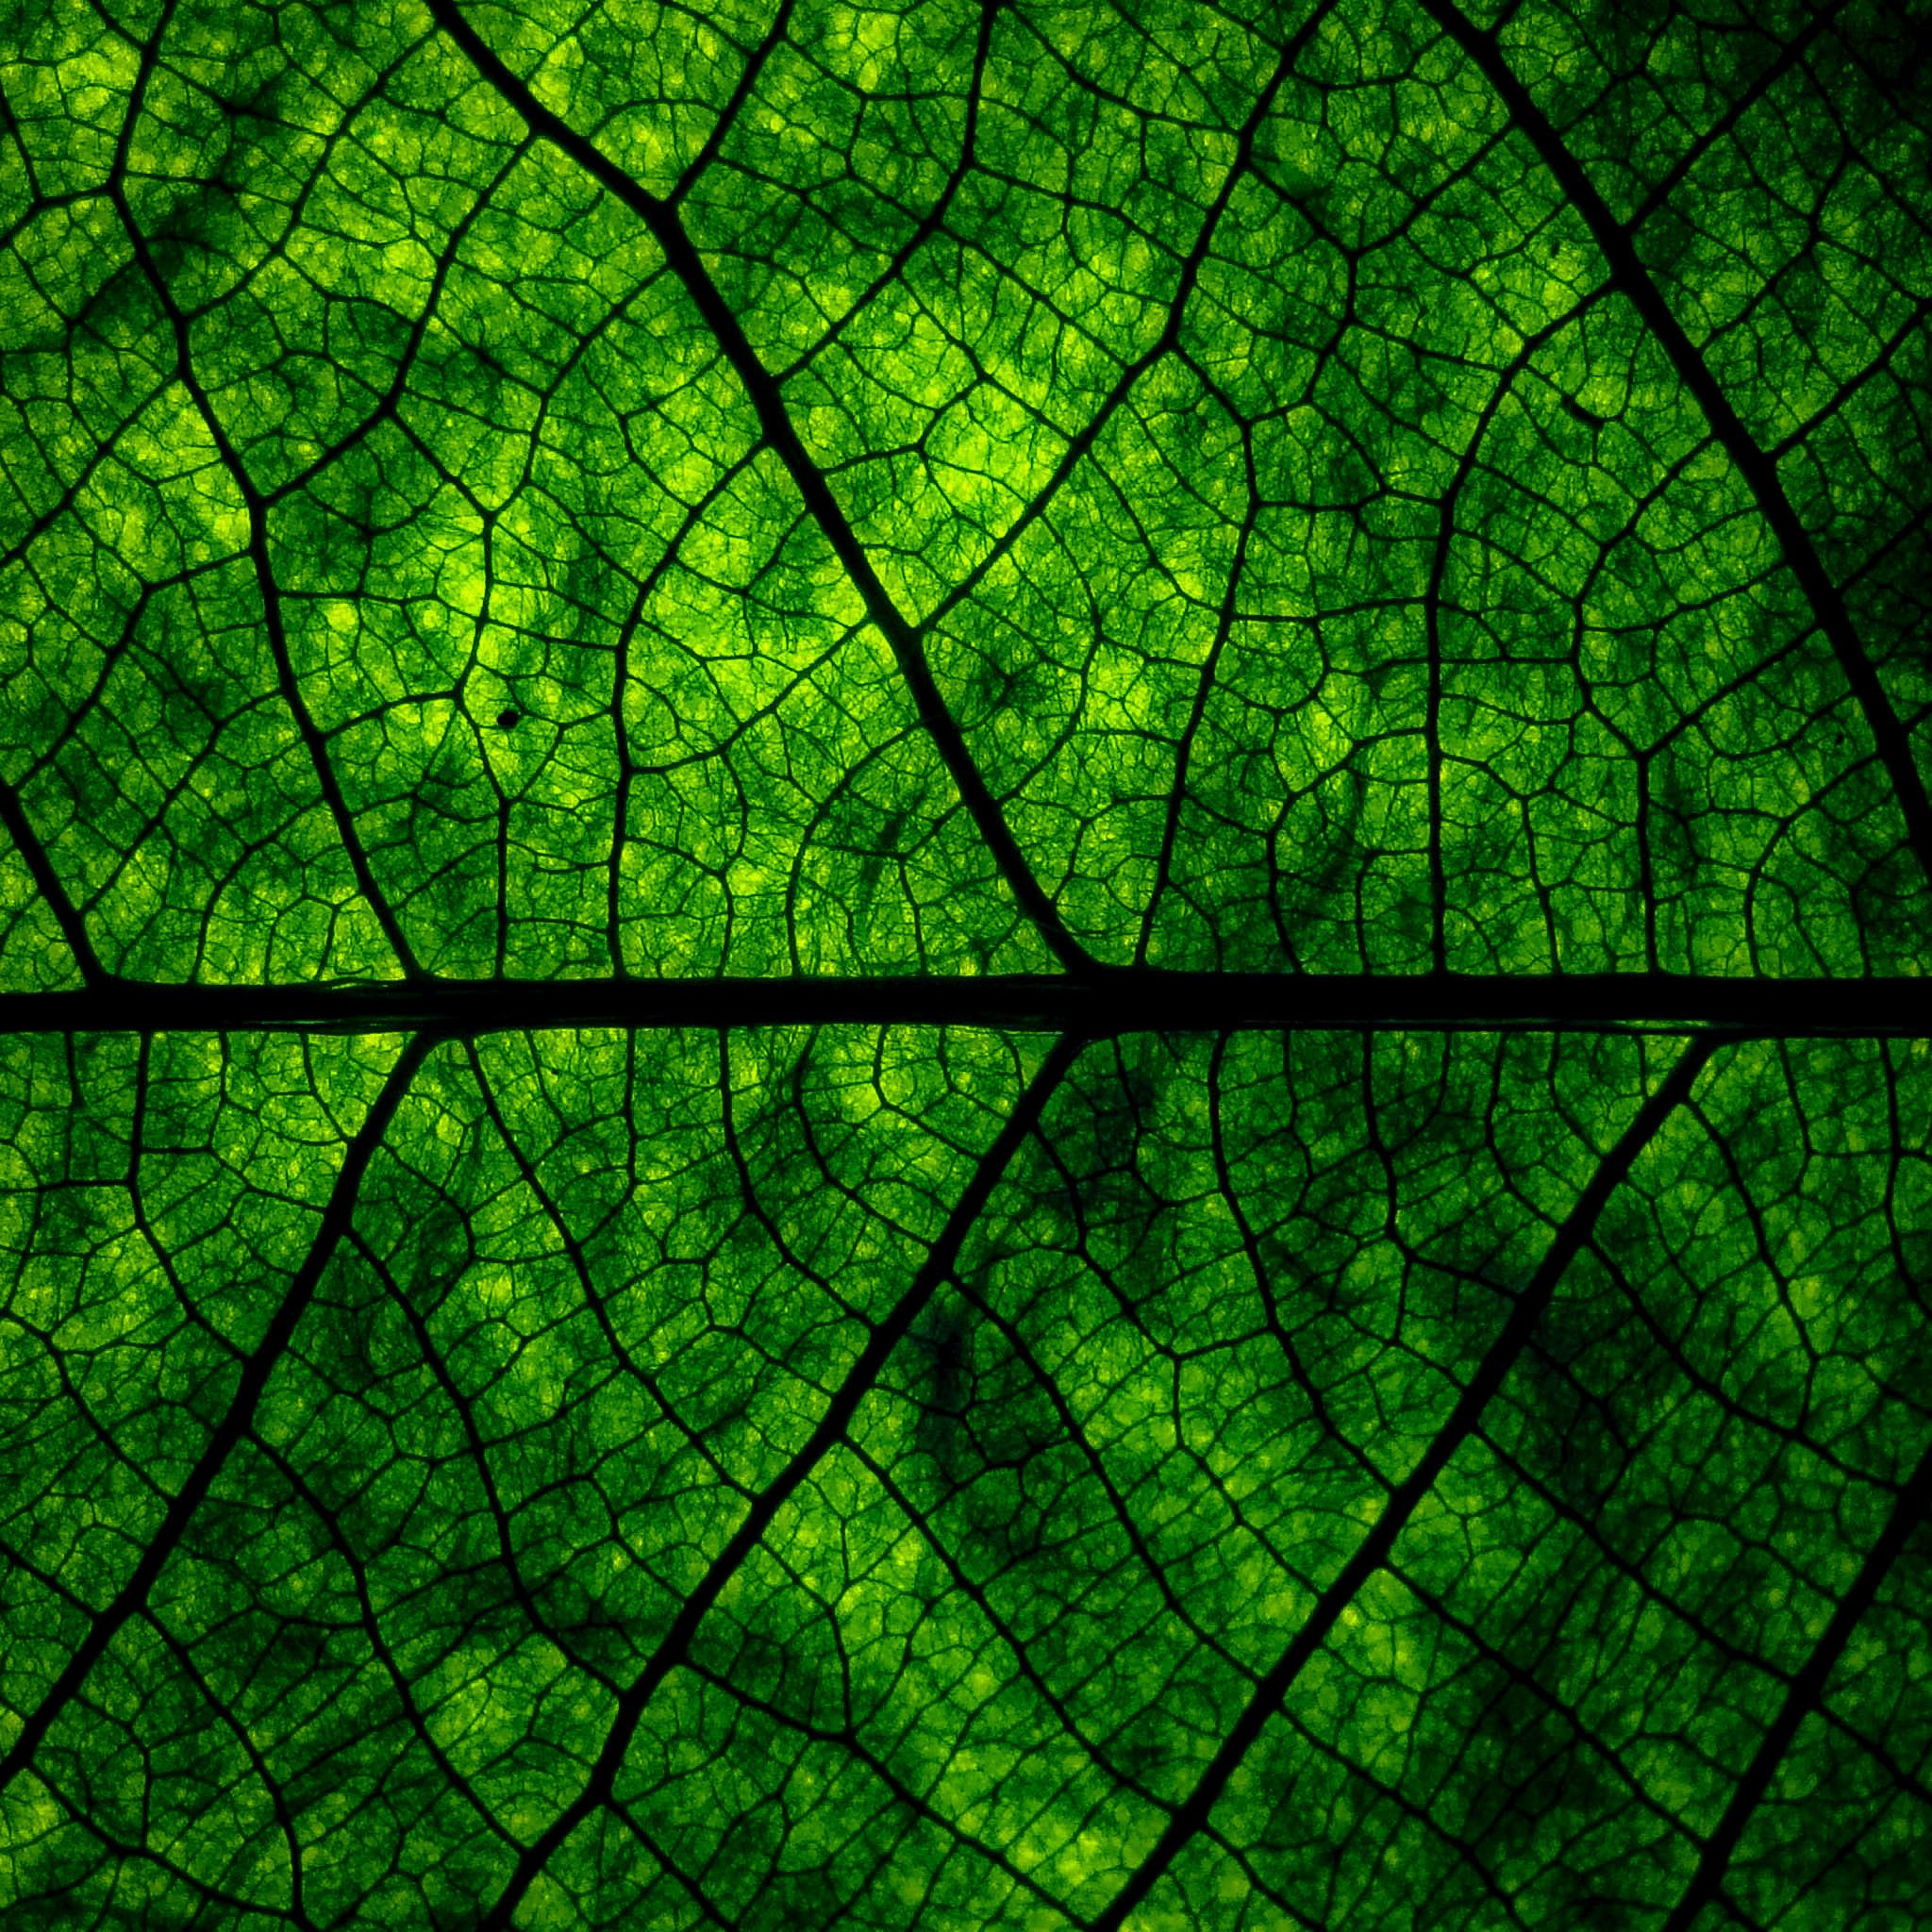 ★ Leaf Veins by @RetinaiPadWalls on twitter.jpg